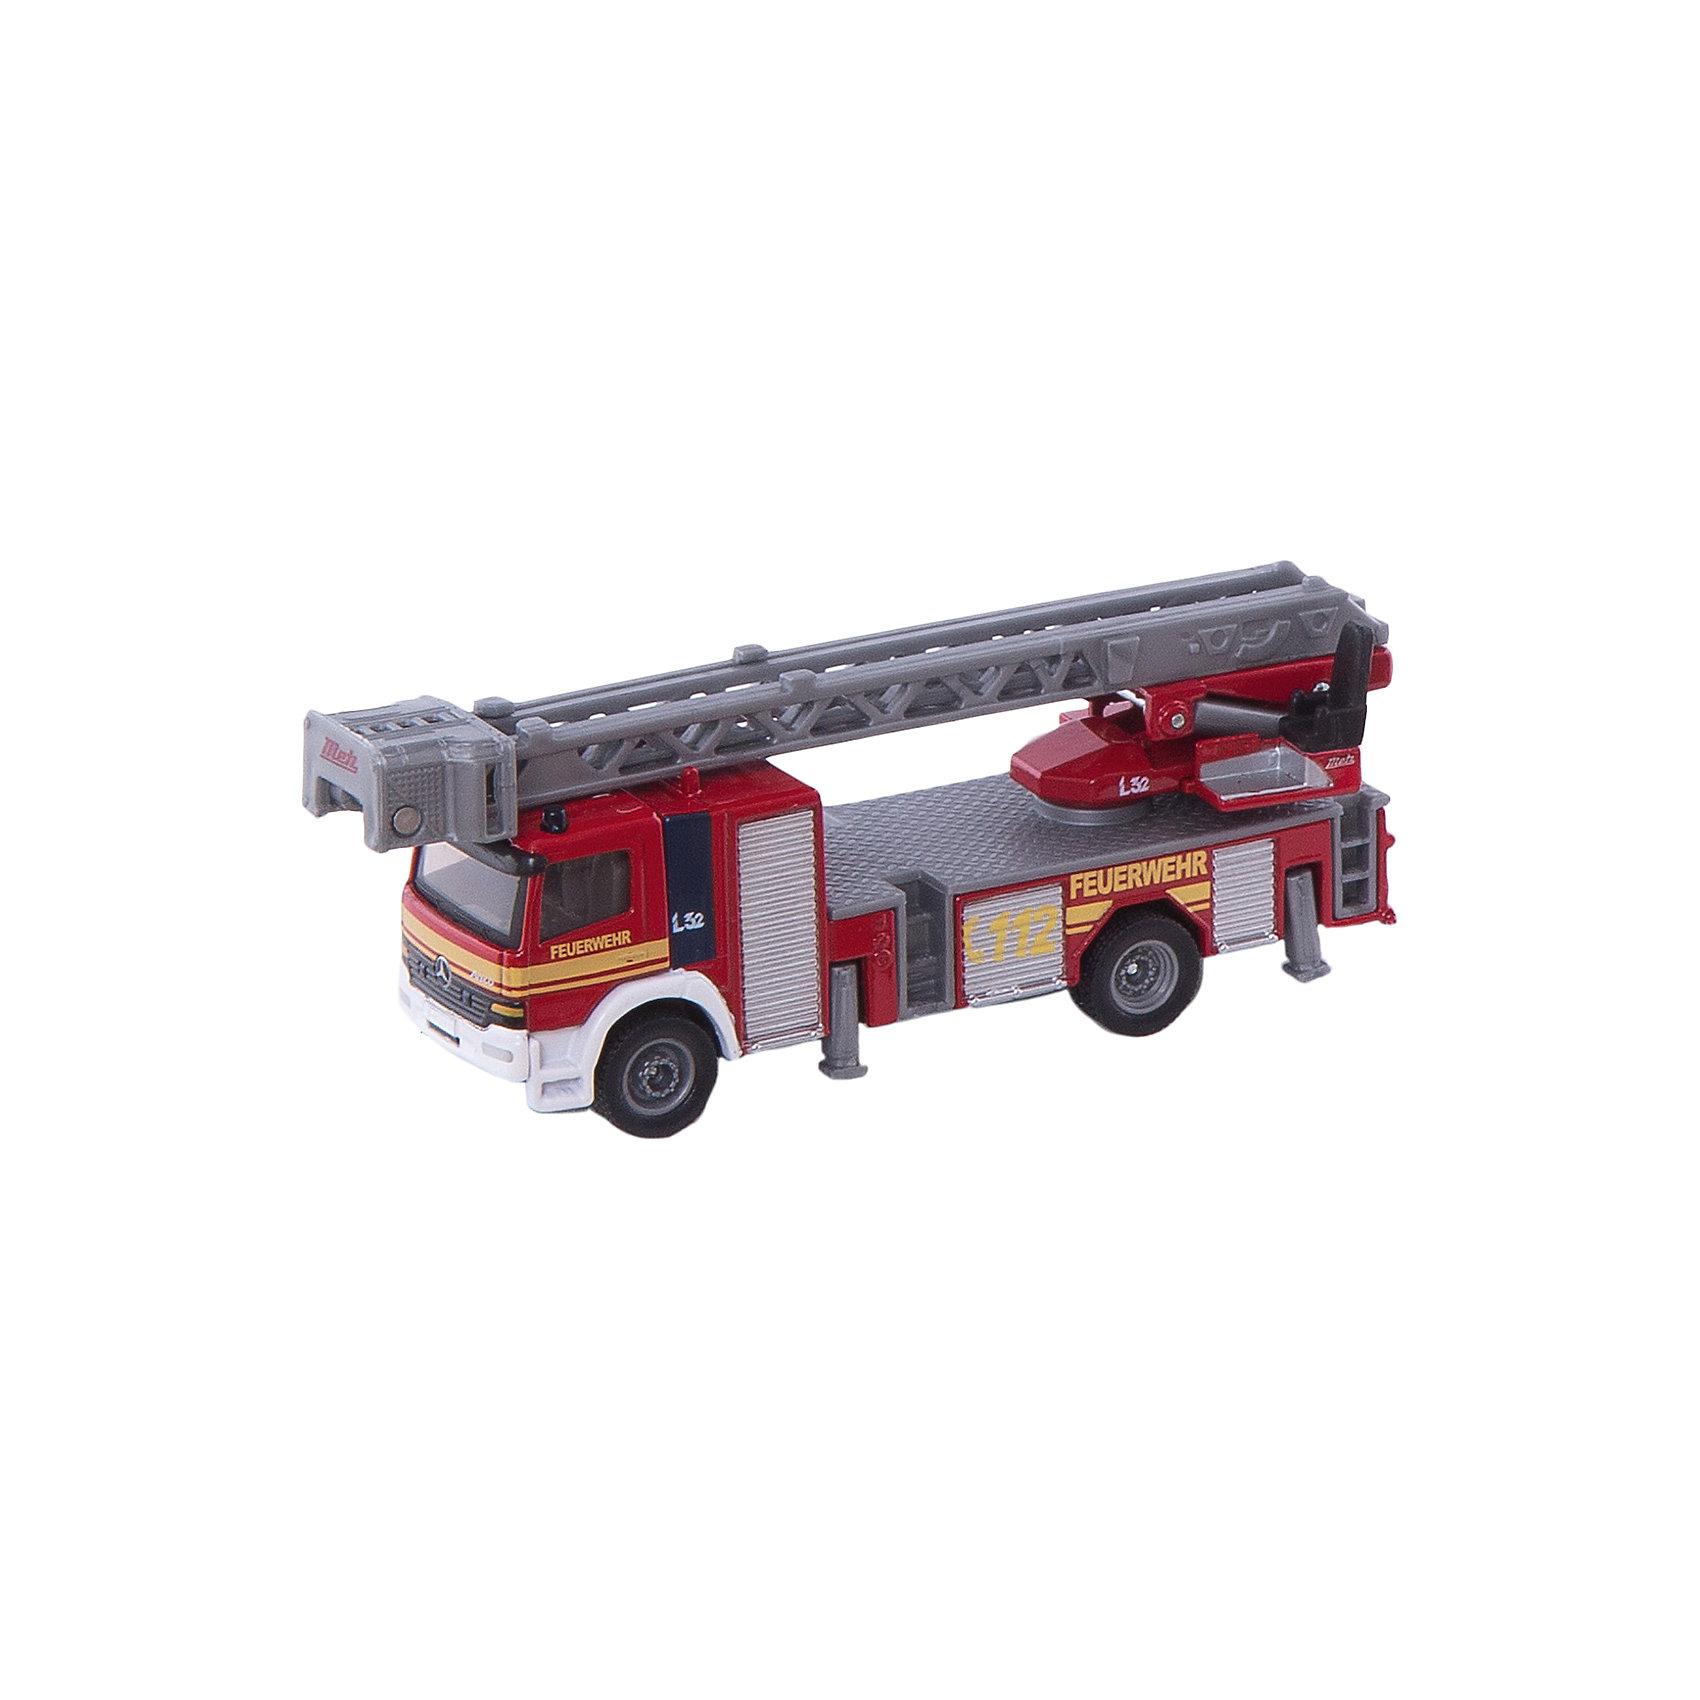 SIKU SIKU 1841 Пожарная машина с лестницей 1:87 siku siku 1007 bmw 645i cabrio